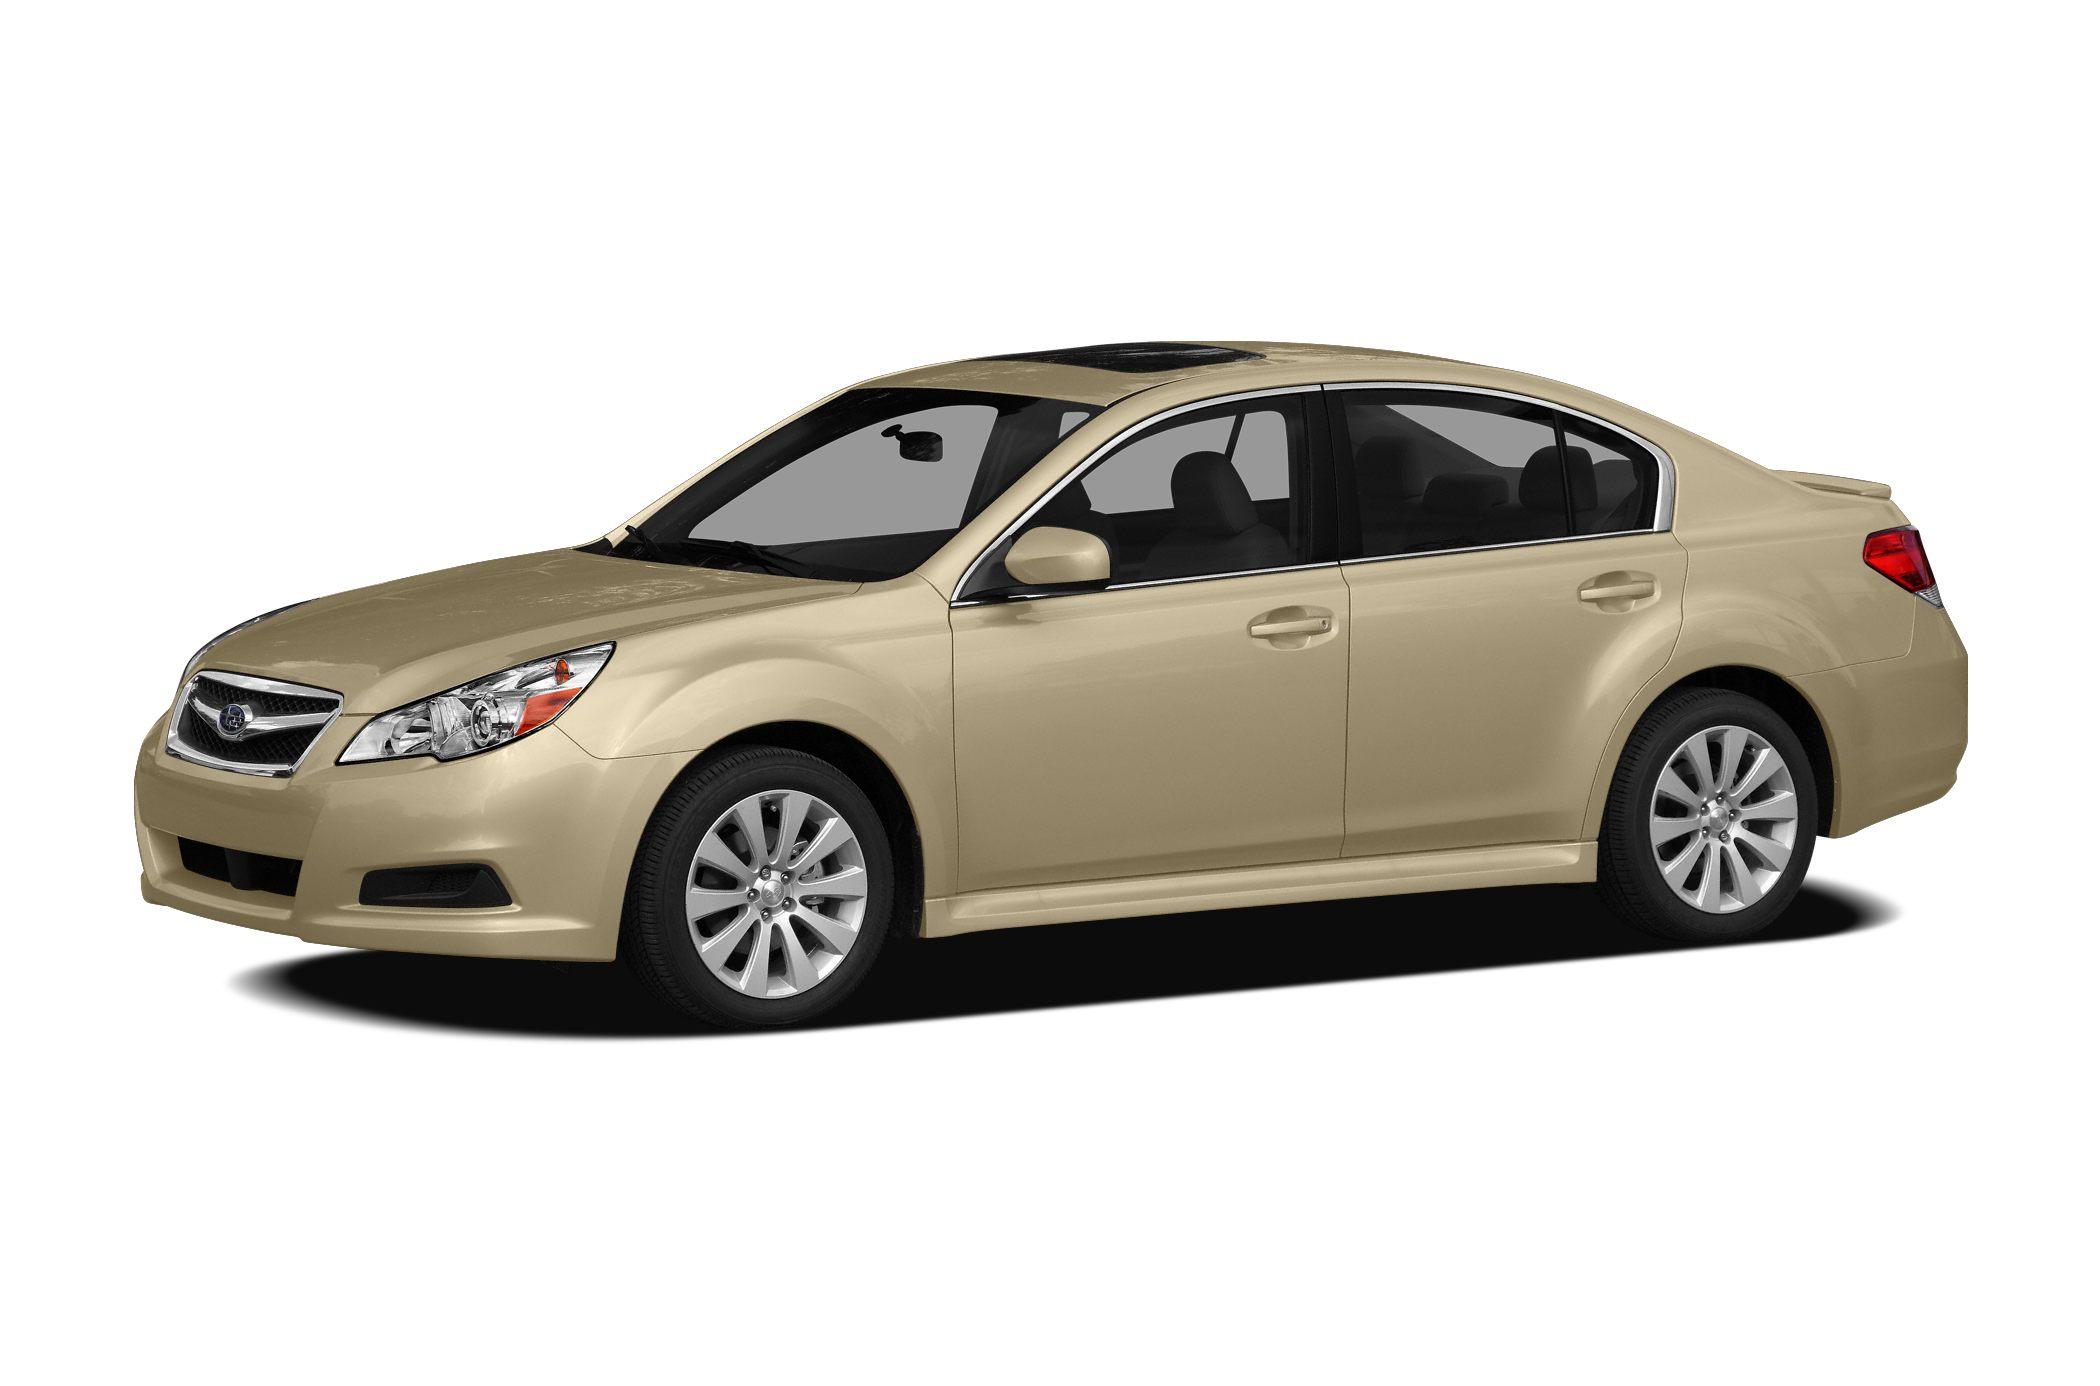 2010 Subaru Legacy 25i Premium ONE PRICE STOP NO HASSLE NO HAGGLE CAR BUYING EXPERIENCE